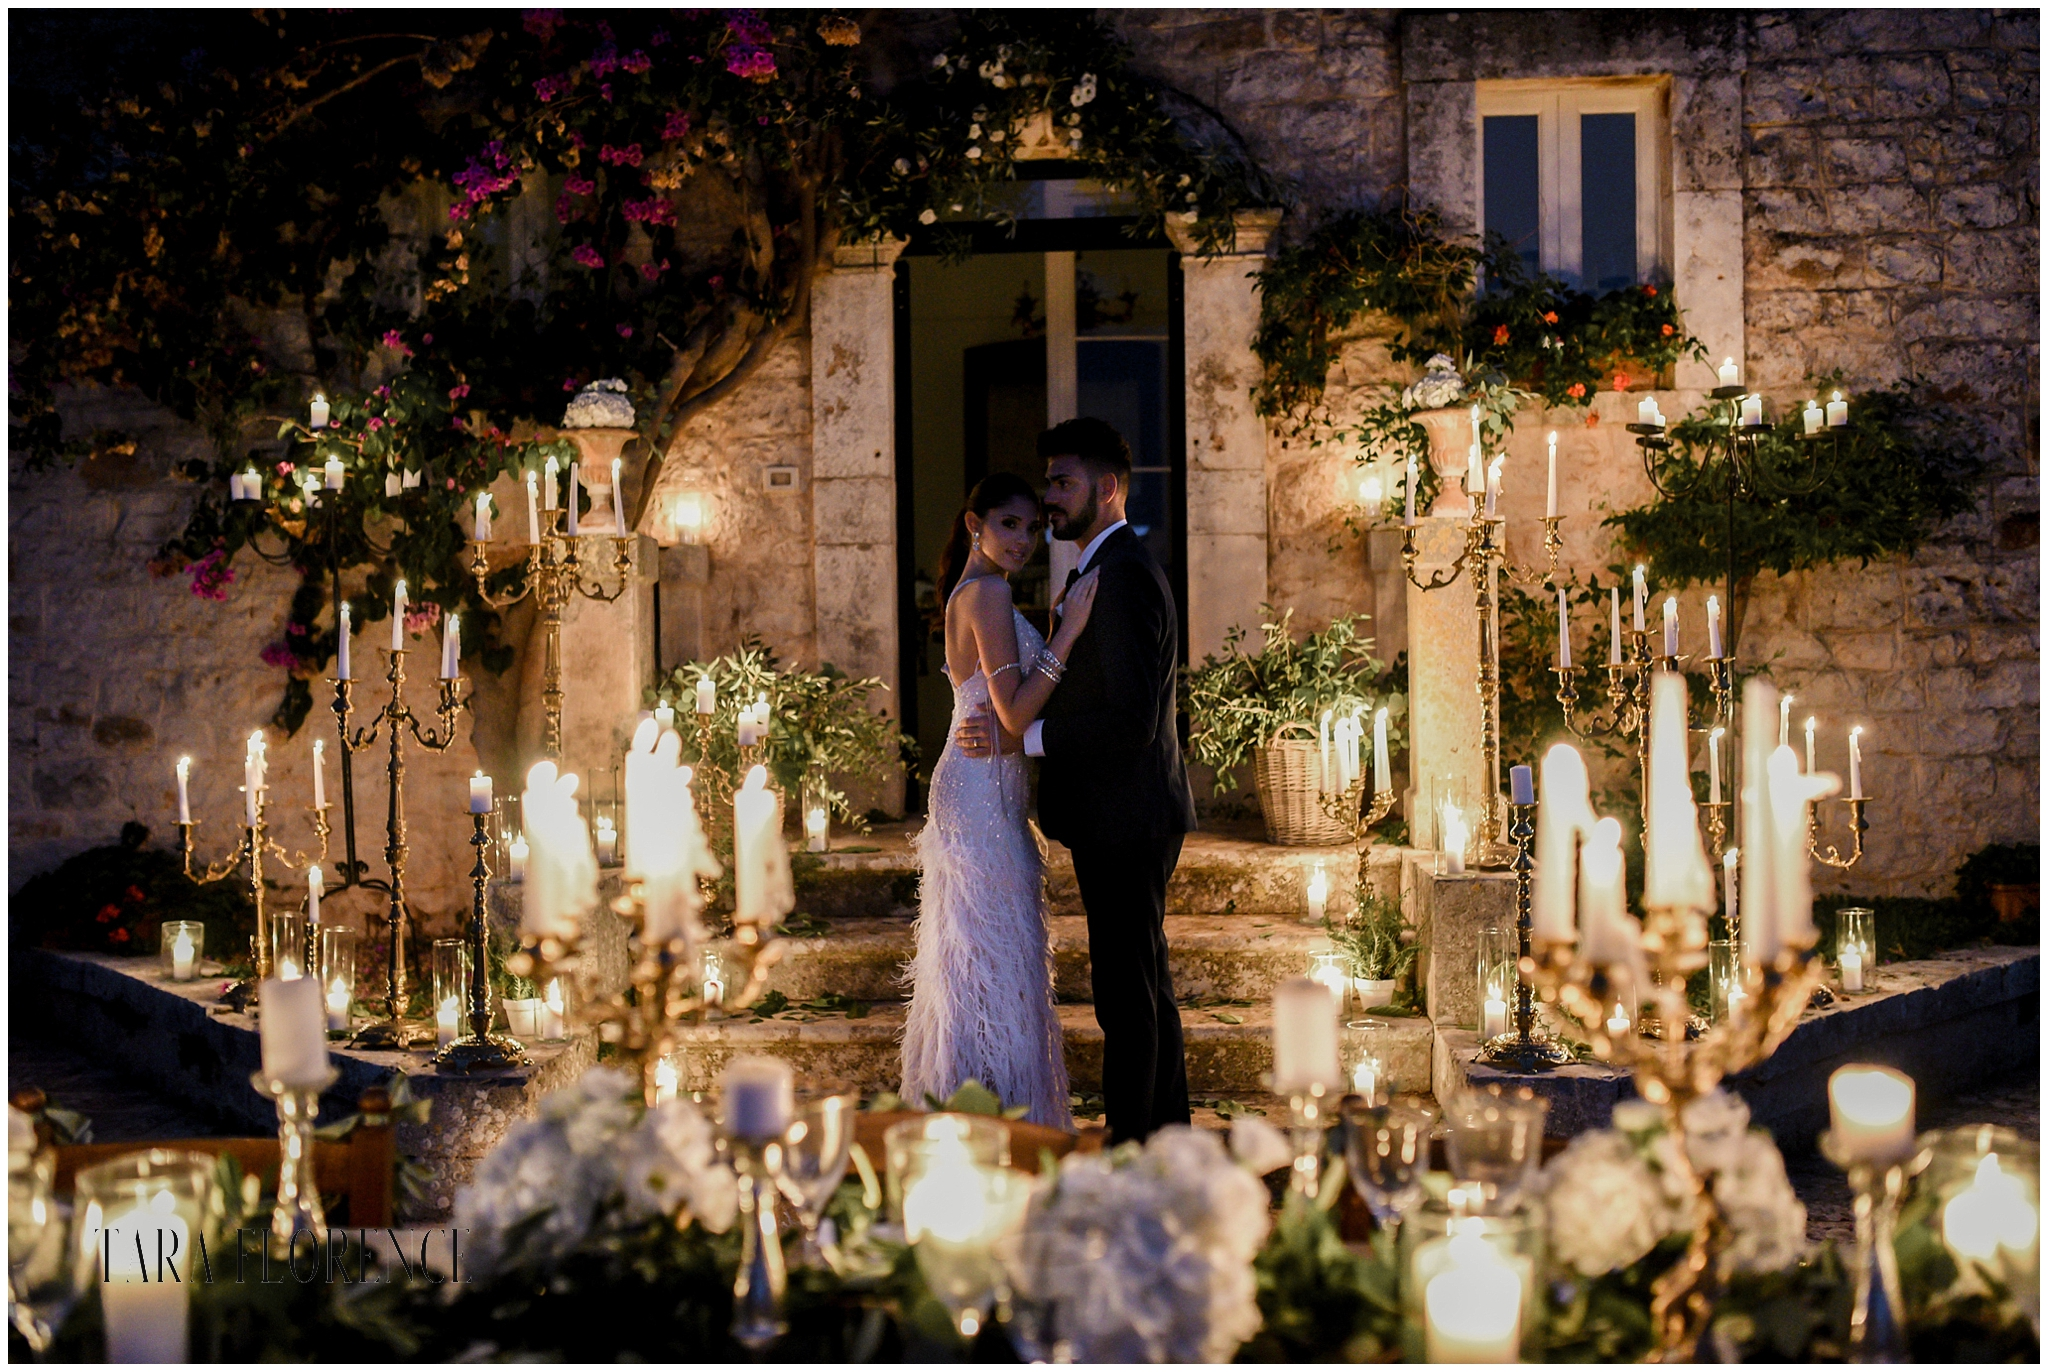 Puglia-Tara-Florence-Bridal-Editorial-184_WEB.jpg